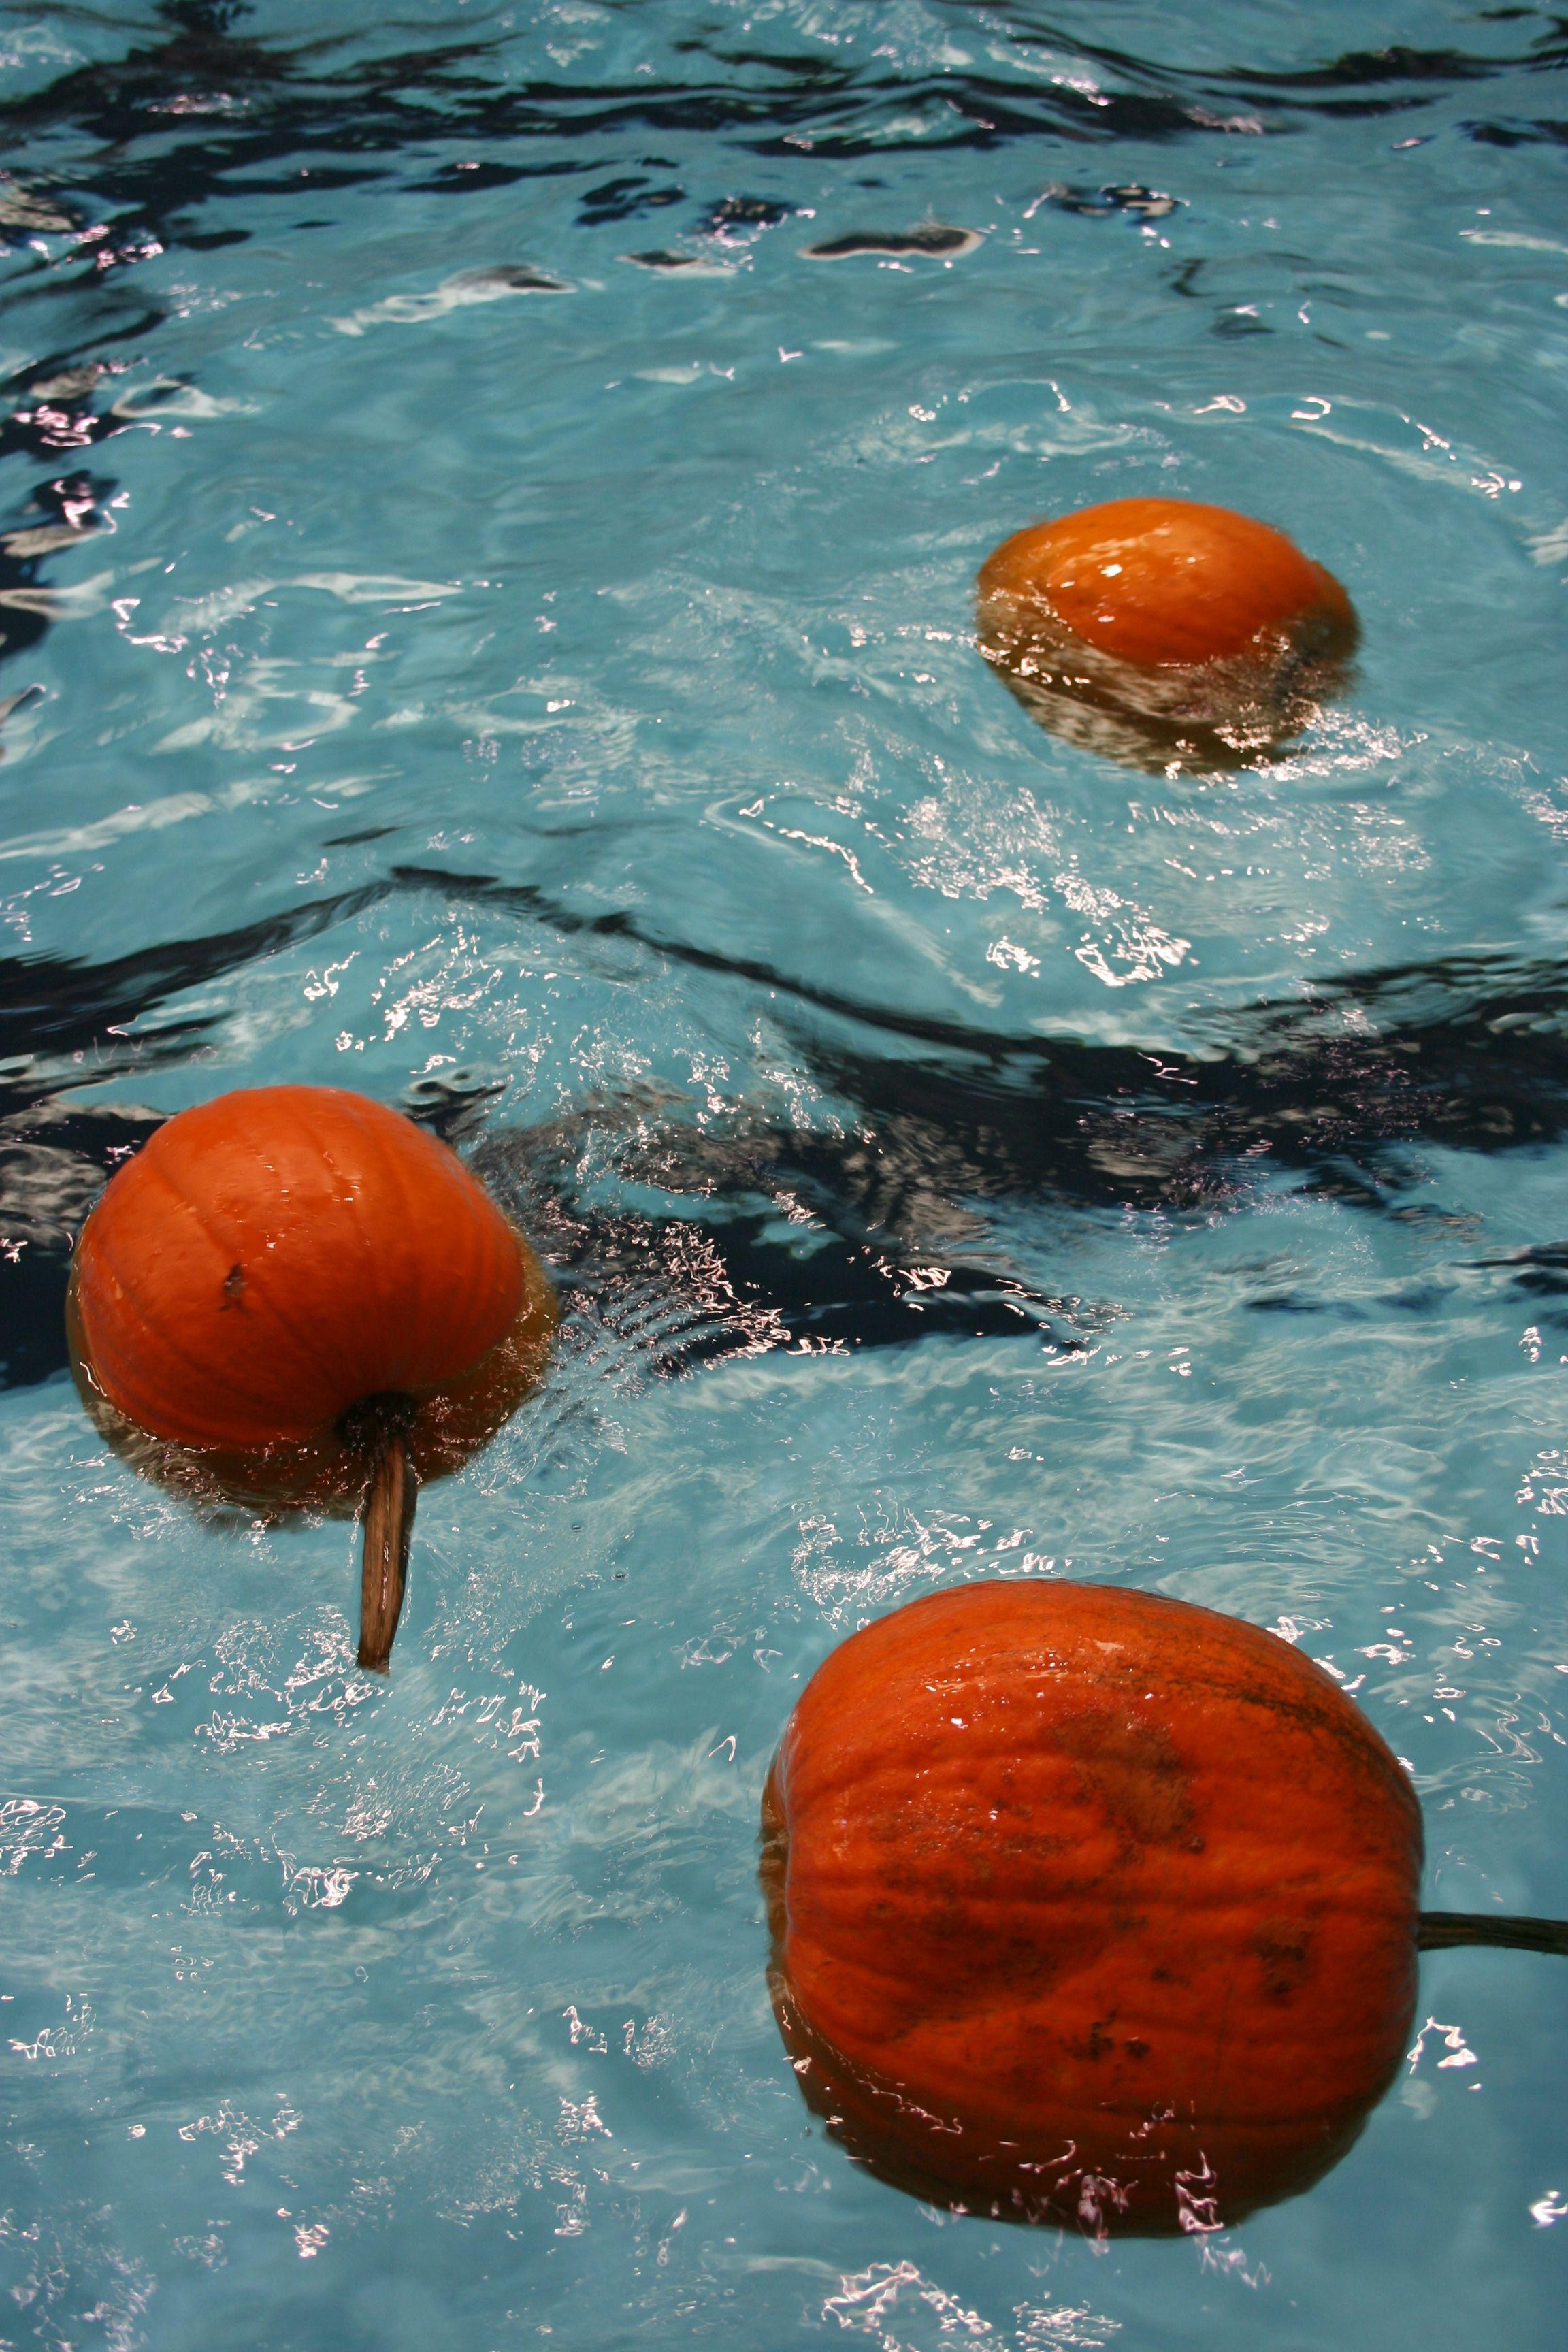 Pumpkin Patch in the Lakewood High School Pool Splash your